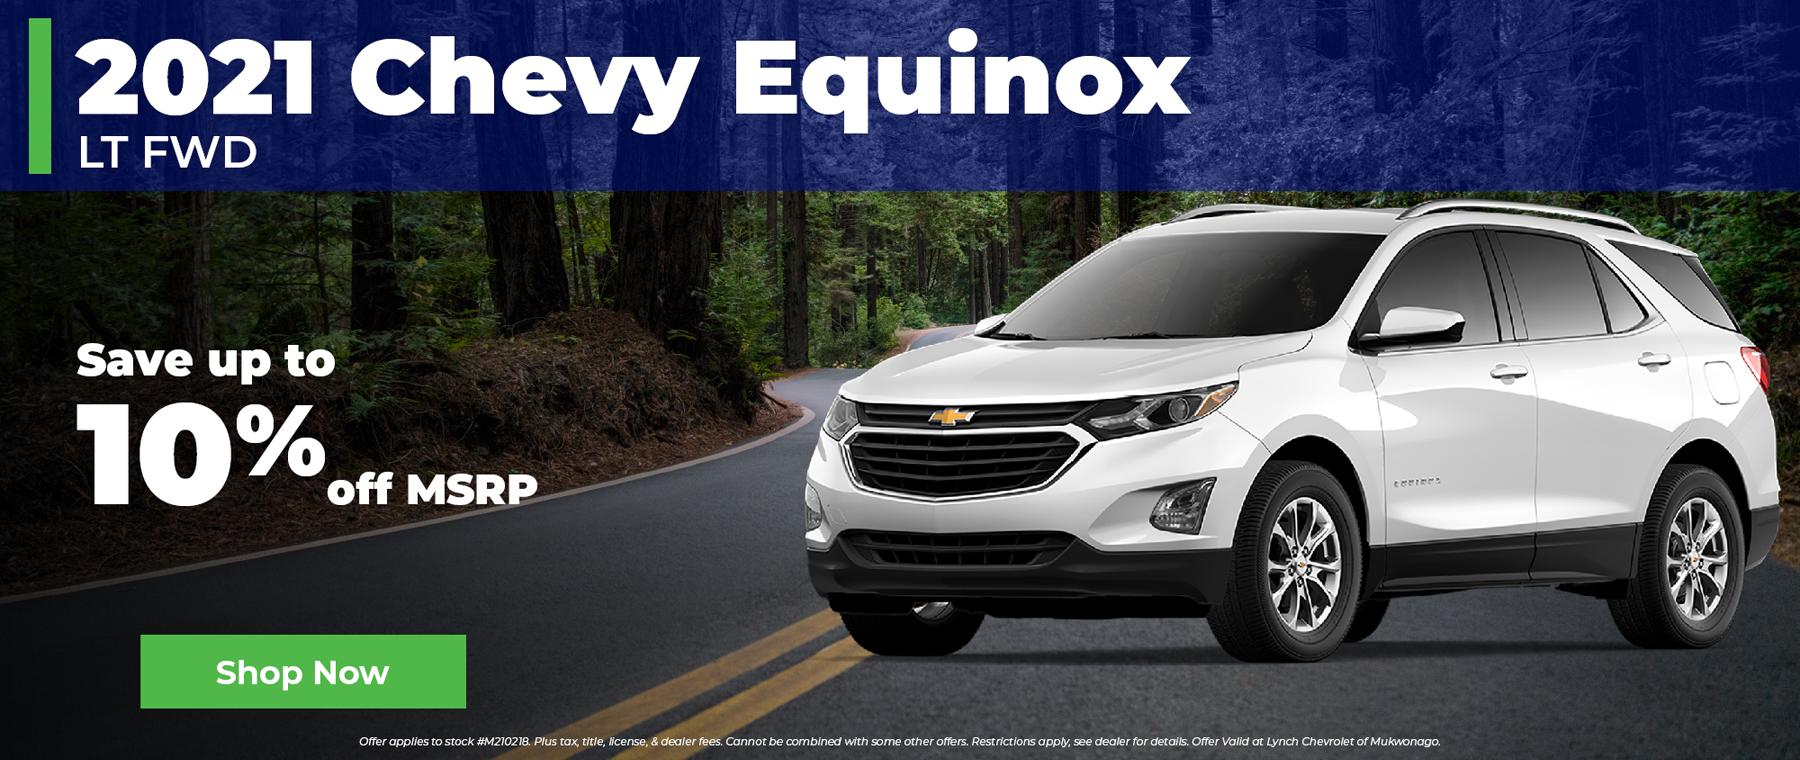 10% Off 2021 Chevy Equinox in Mukwonago Wisconsin